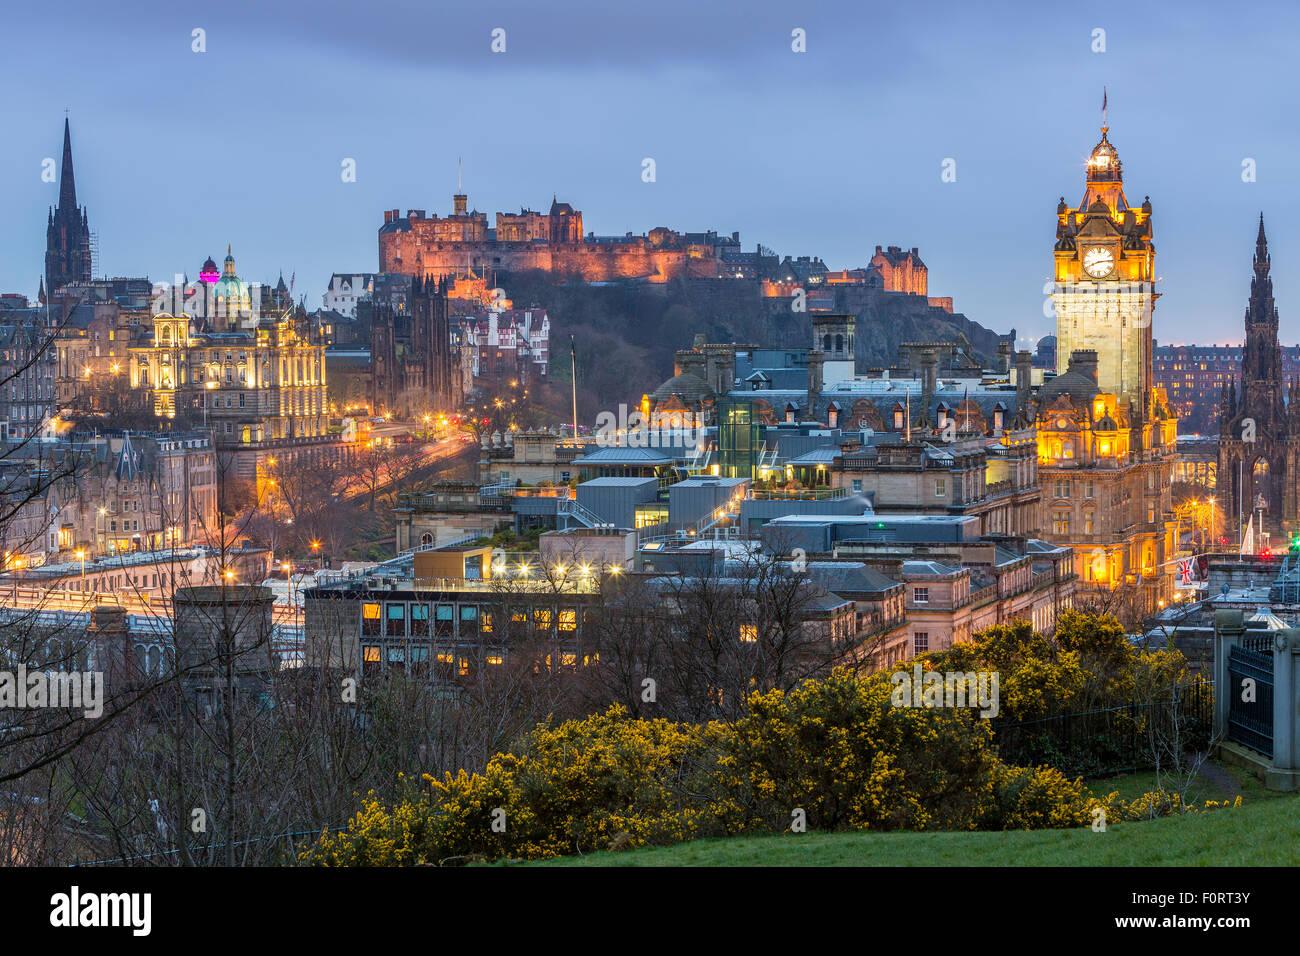 A view from Calton Hill over Edinburgh, City of Edinburgh, Scotland, United Kingdom, Europe. Stock Photo